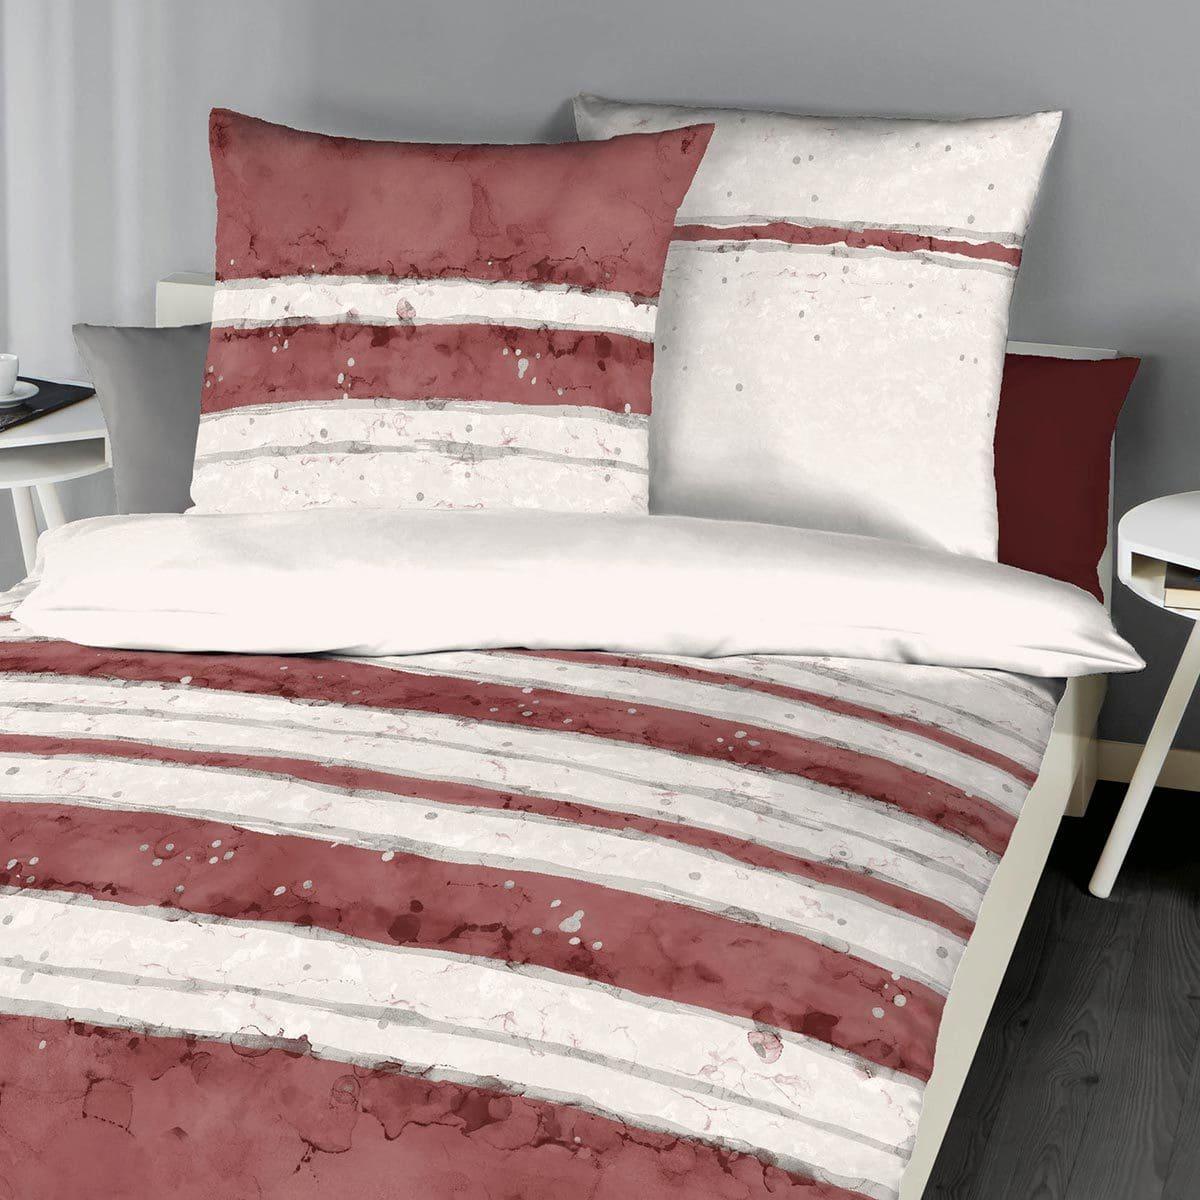 kaeppel mako satin bettw sche aquarello rubin g nstig. Black Bedroom Furniture Sets. Home Design Ideas